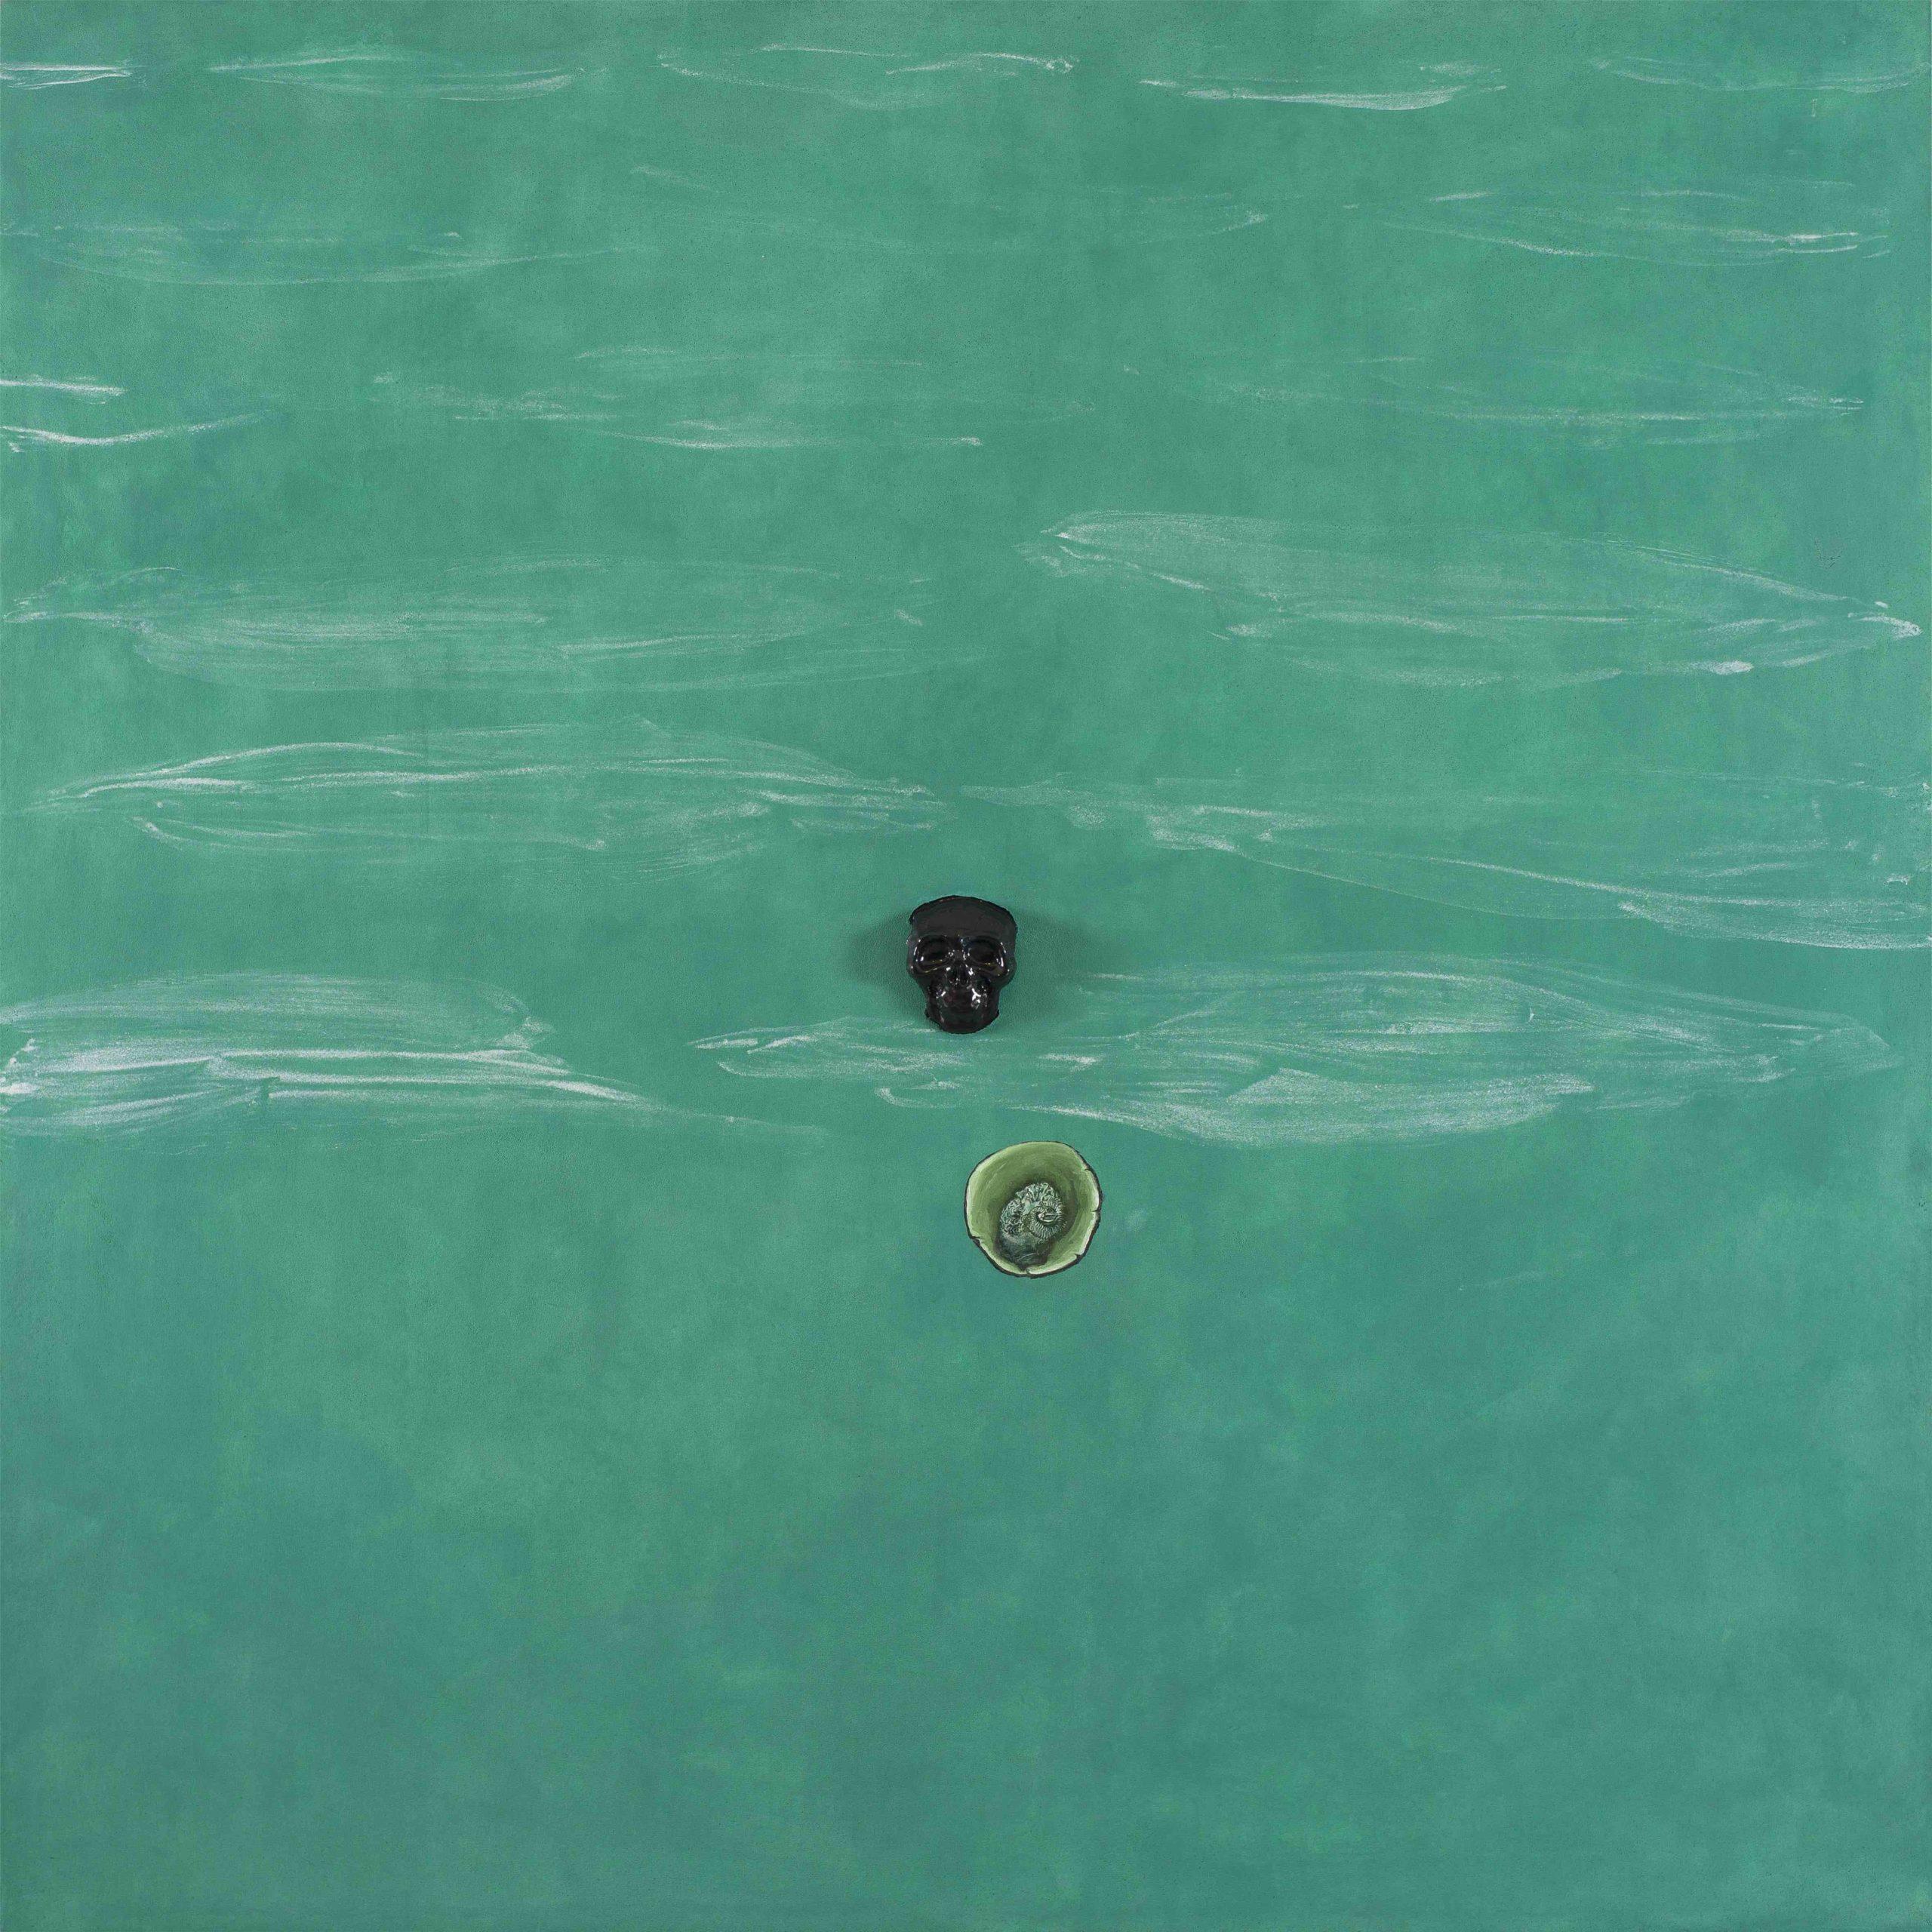 """Porco Giove"" 2013, pittura ad olio e ceramica su affresco, 180 x 180 cm"